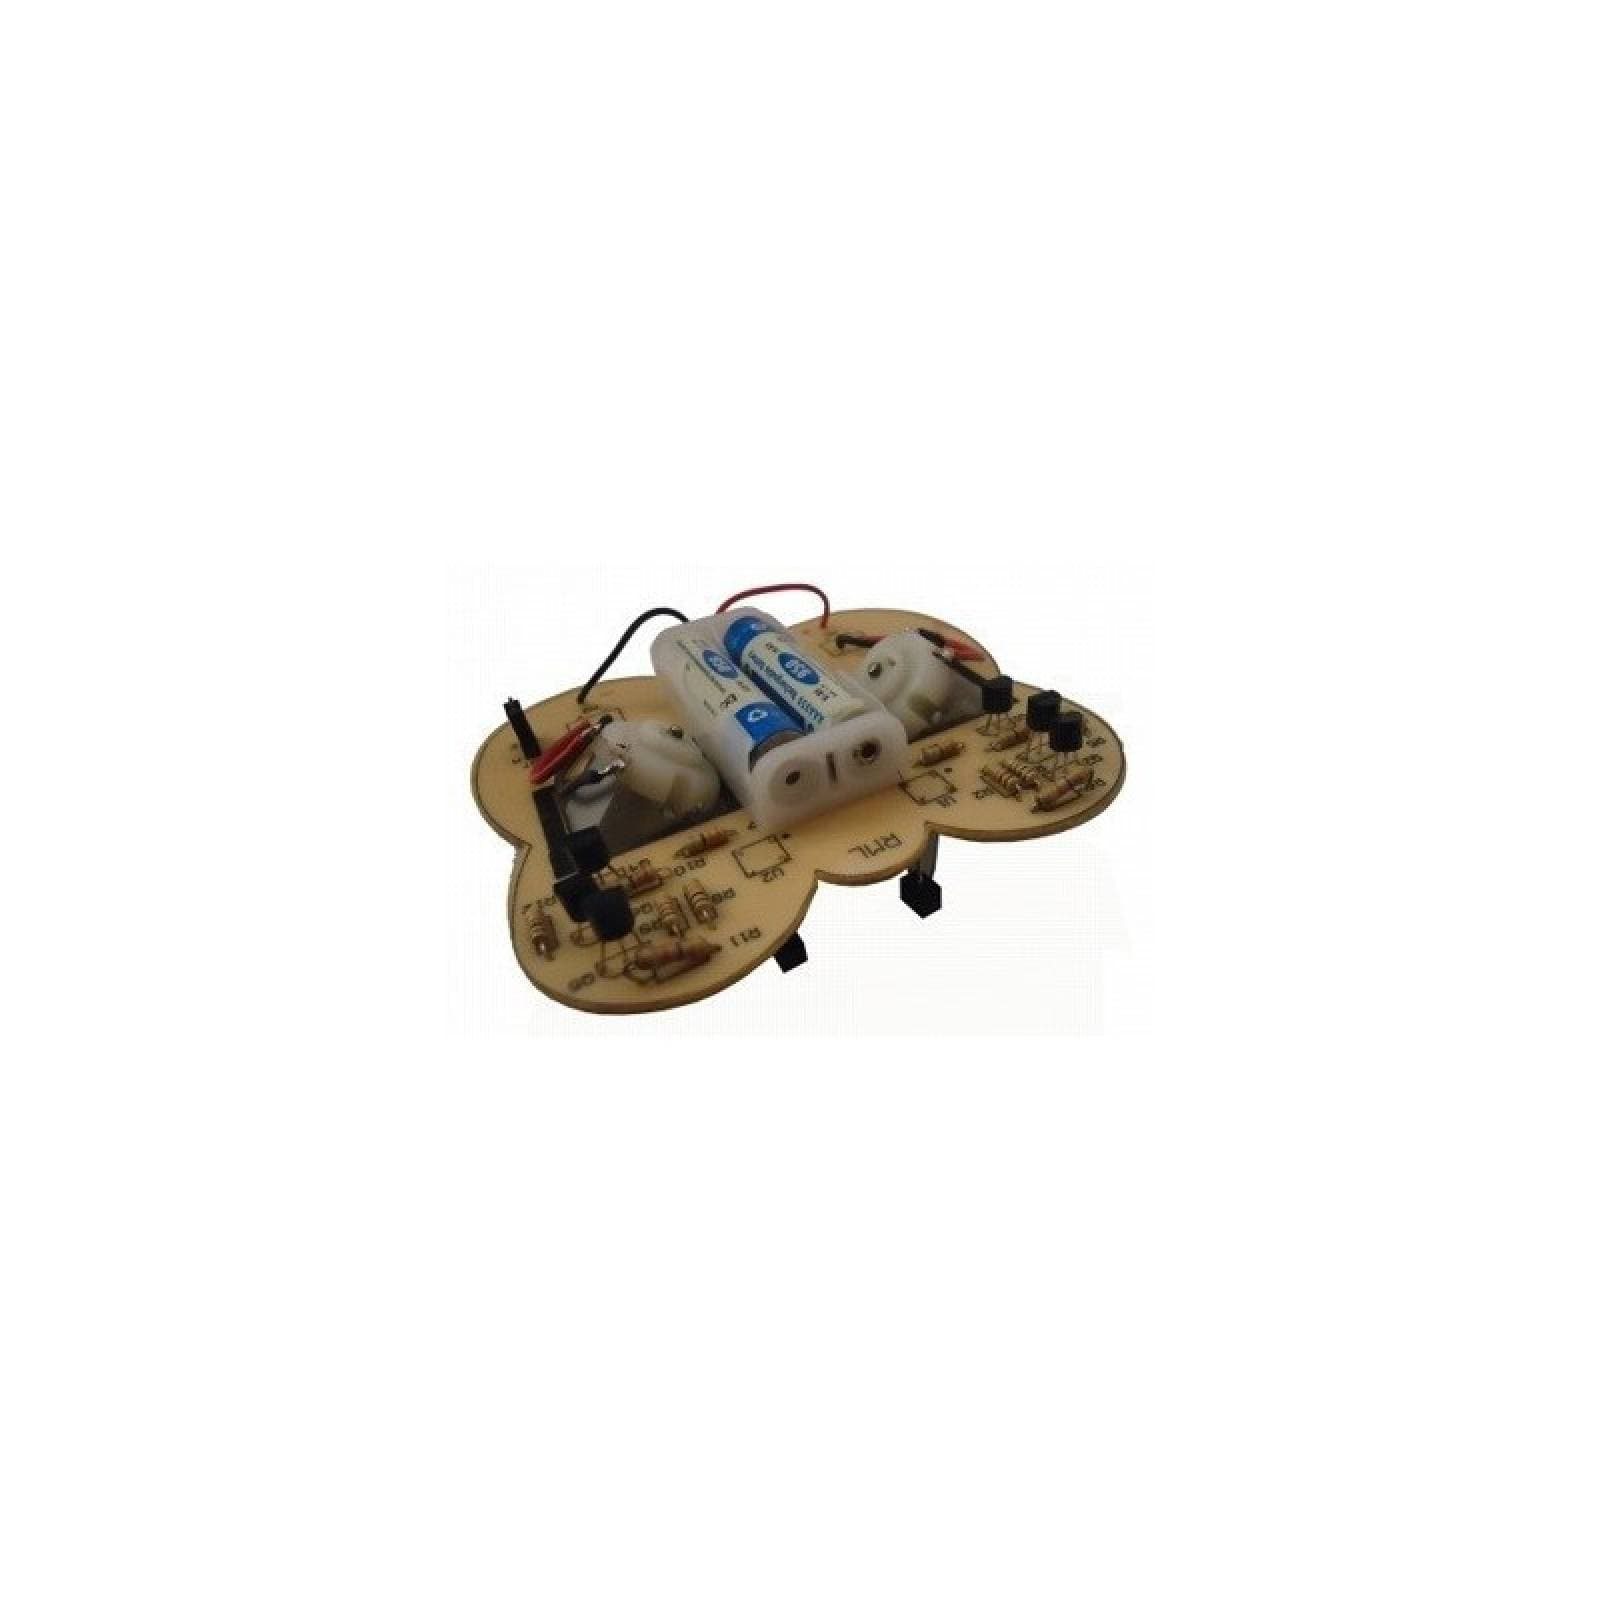 Kit Para Armar Robot Mariposa Seguidora De Líneas Negras